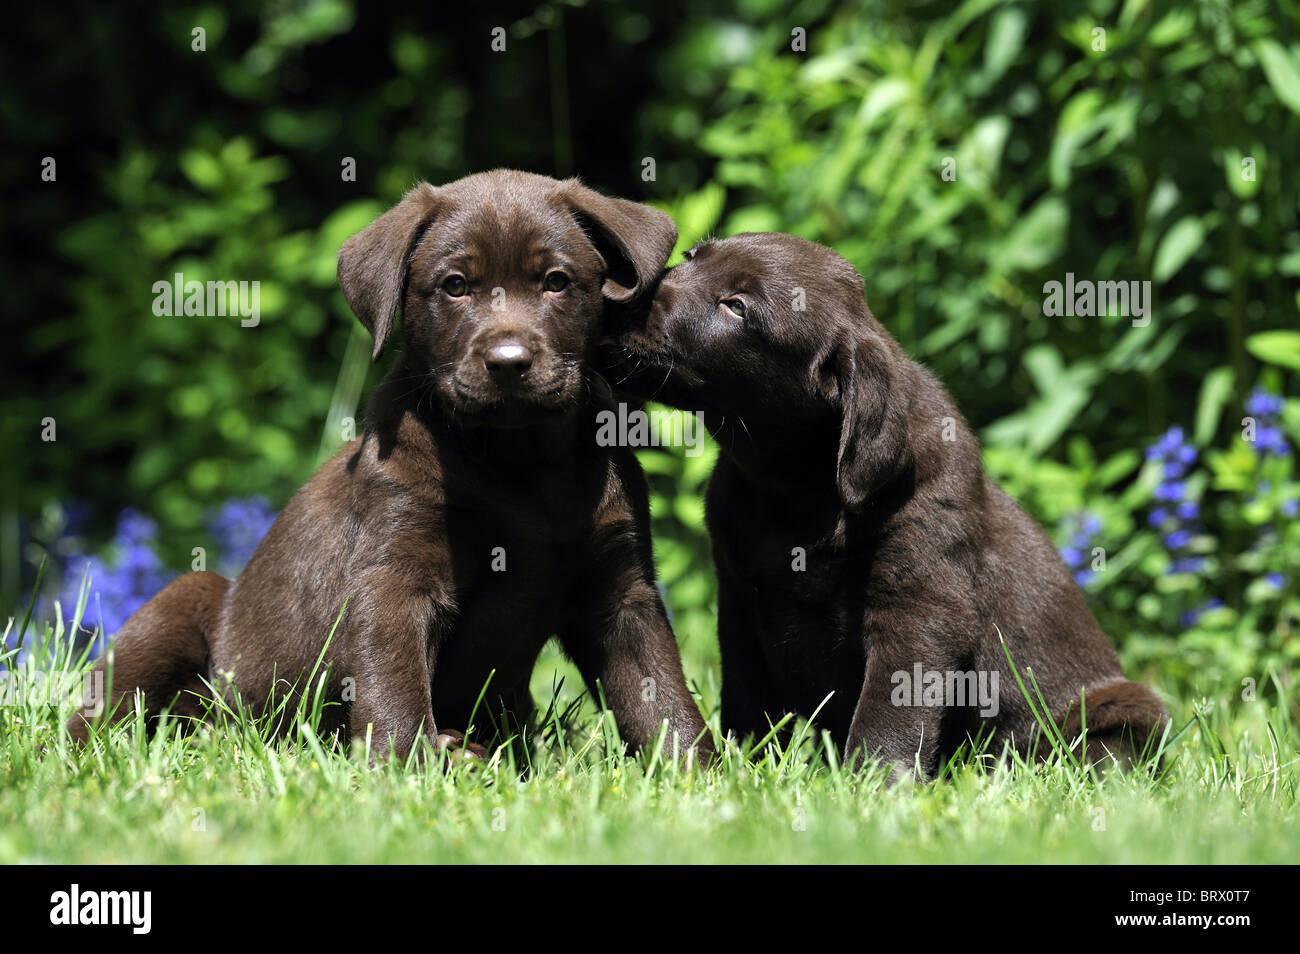 Labrador Retriever, Chocolate Labrador (Canis lupus familiaris), two puppies sitting in a garden. - Stock Image